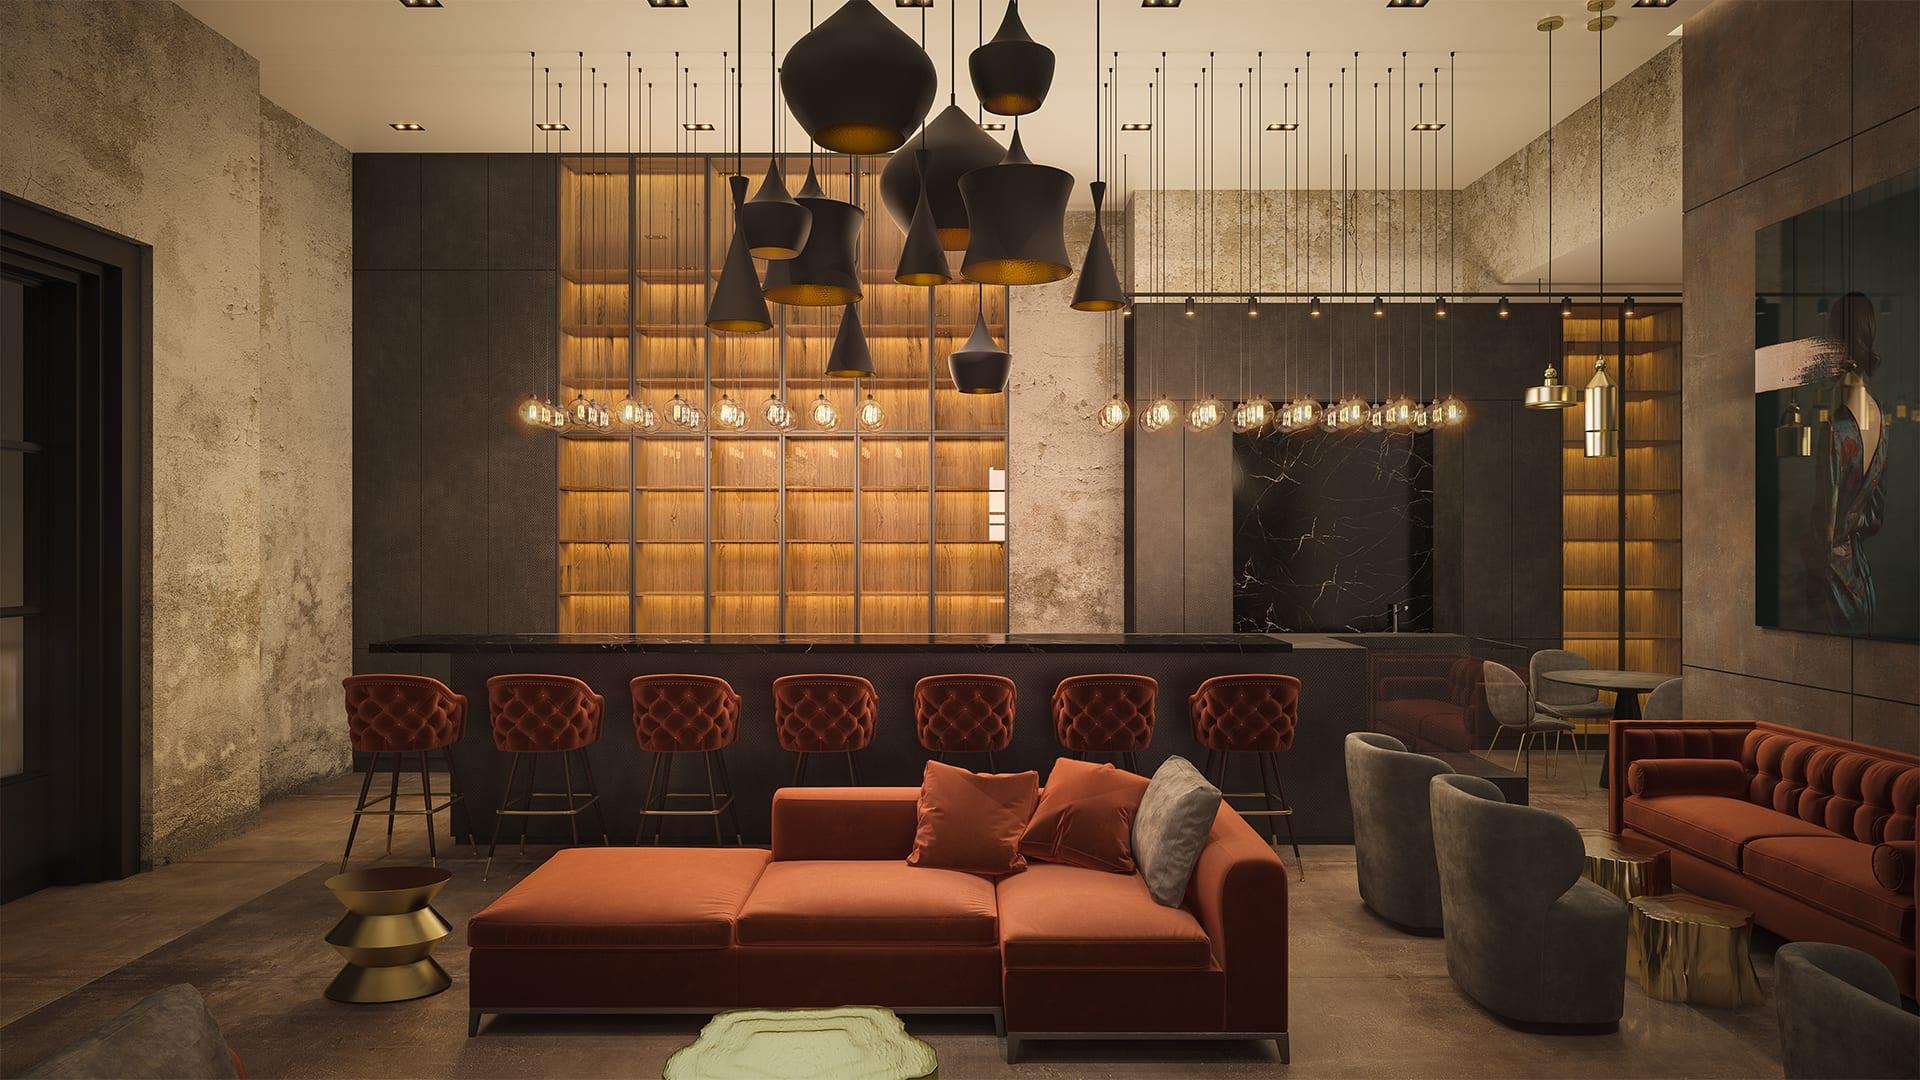 Maayan-Golan_Architectural-Visualization_interior-design-visualization_citrus-events_Coffee-bar_02